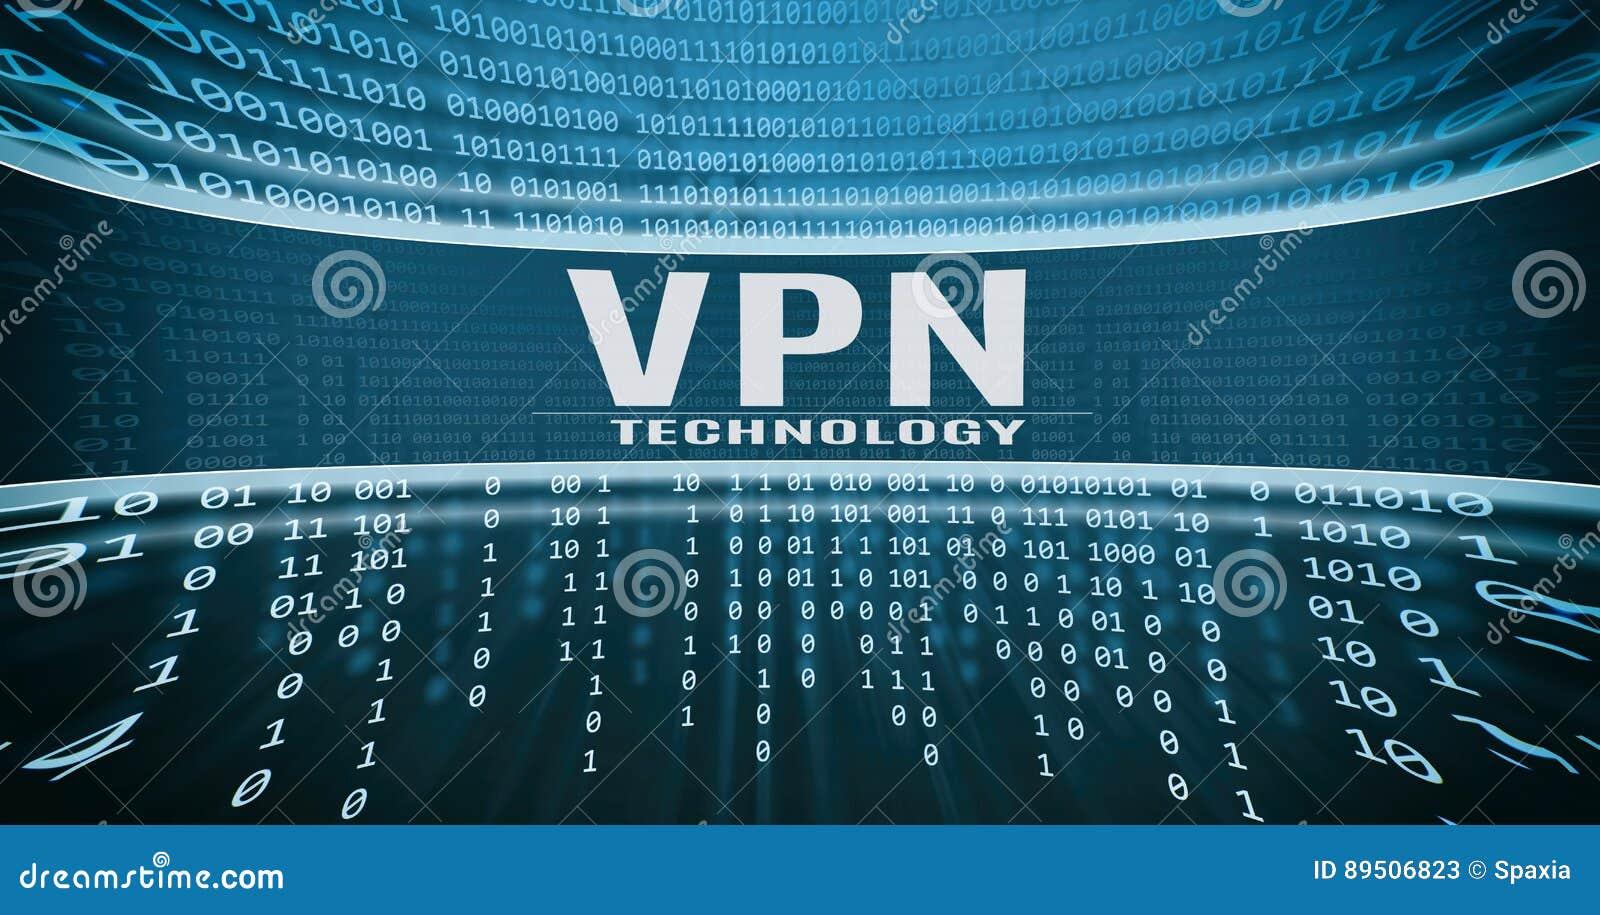 VPN technology concept